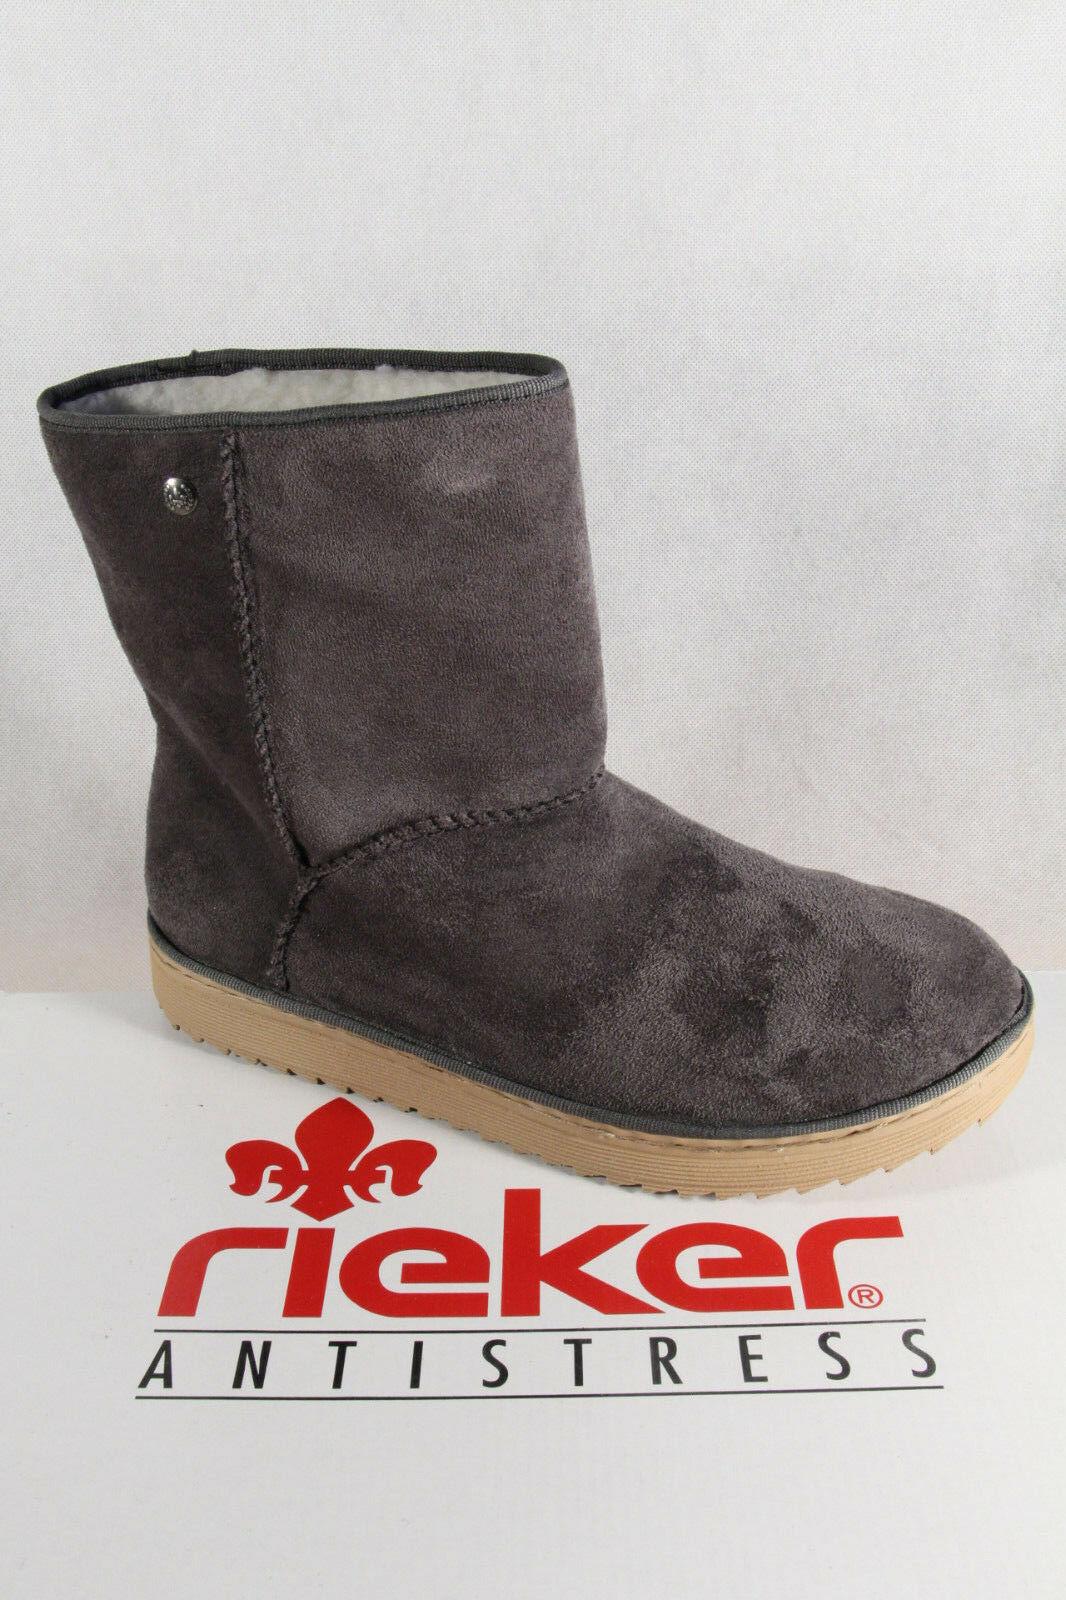 Stiefeletten Neu Damen Y7881 Stiefel Rieker Grau Boots Winterstiefel srdtQCh